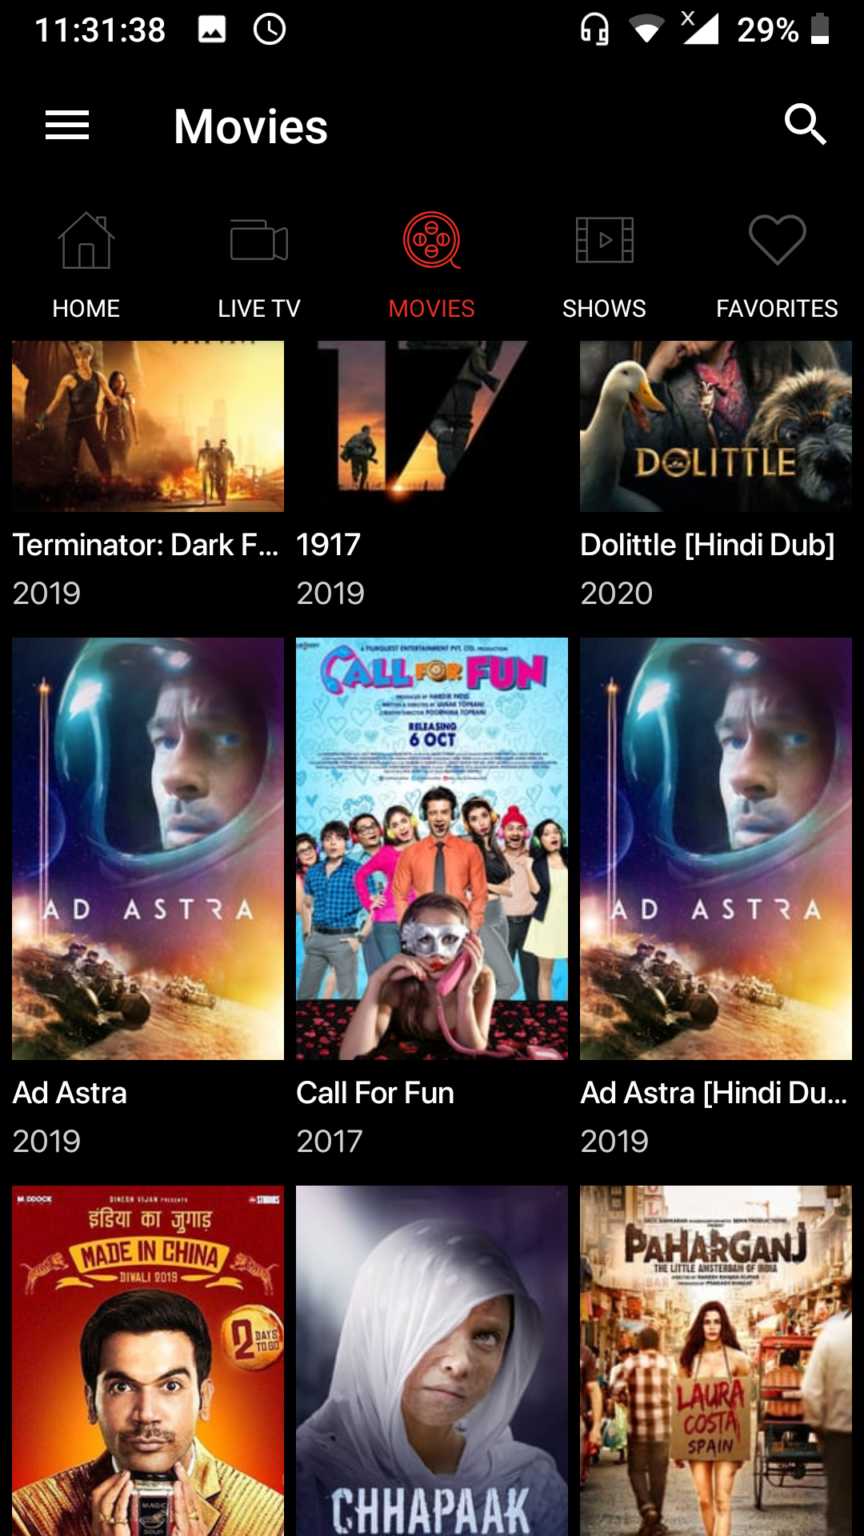 [Redflix Tv] Iflix Netflix Hotstar সবকিছুর দিন শেষ হলিউড, বলিউড মুভি, টিভি শো এবং লাইভ টিভির আনলিমিটেড একসেস নিয়ে নিন।[10MB]